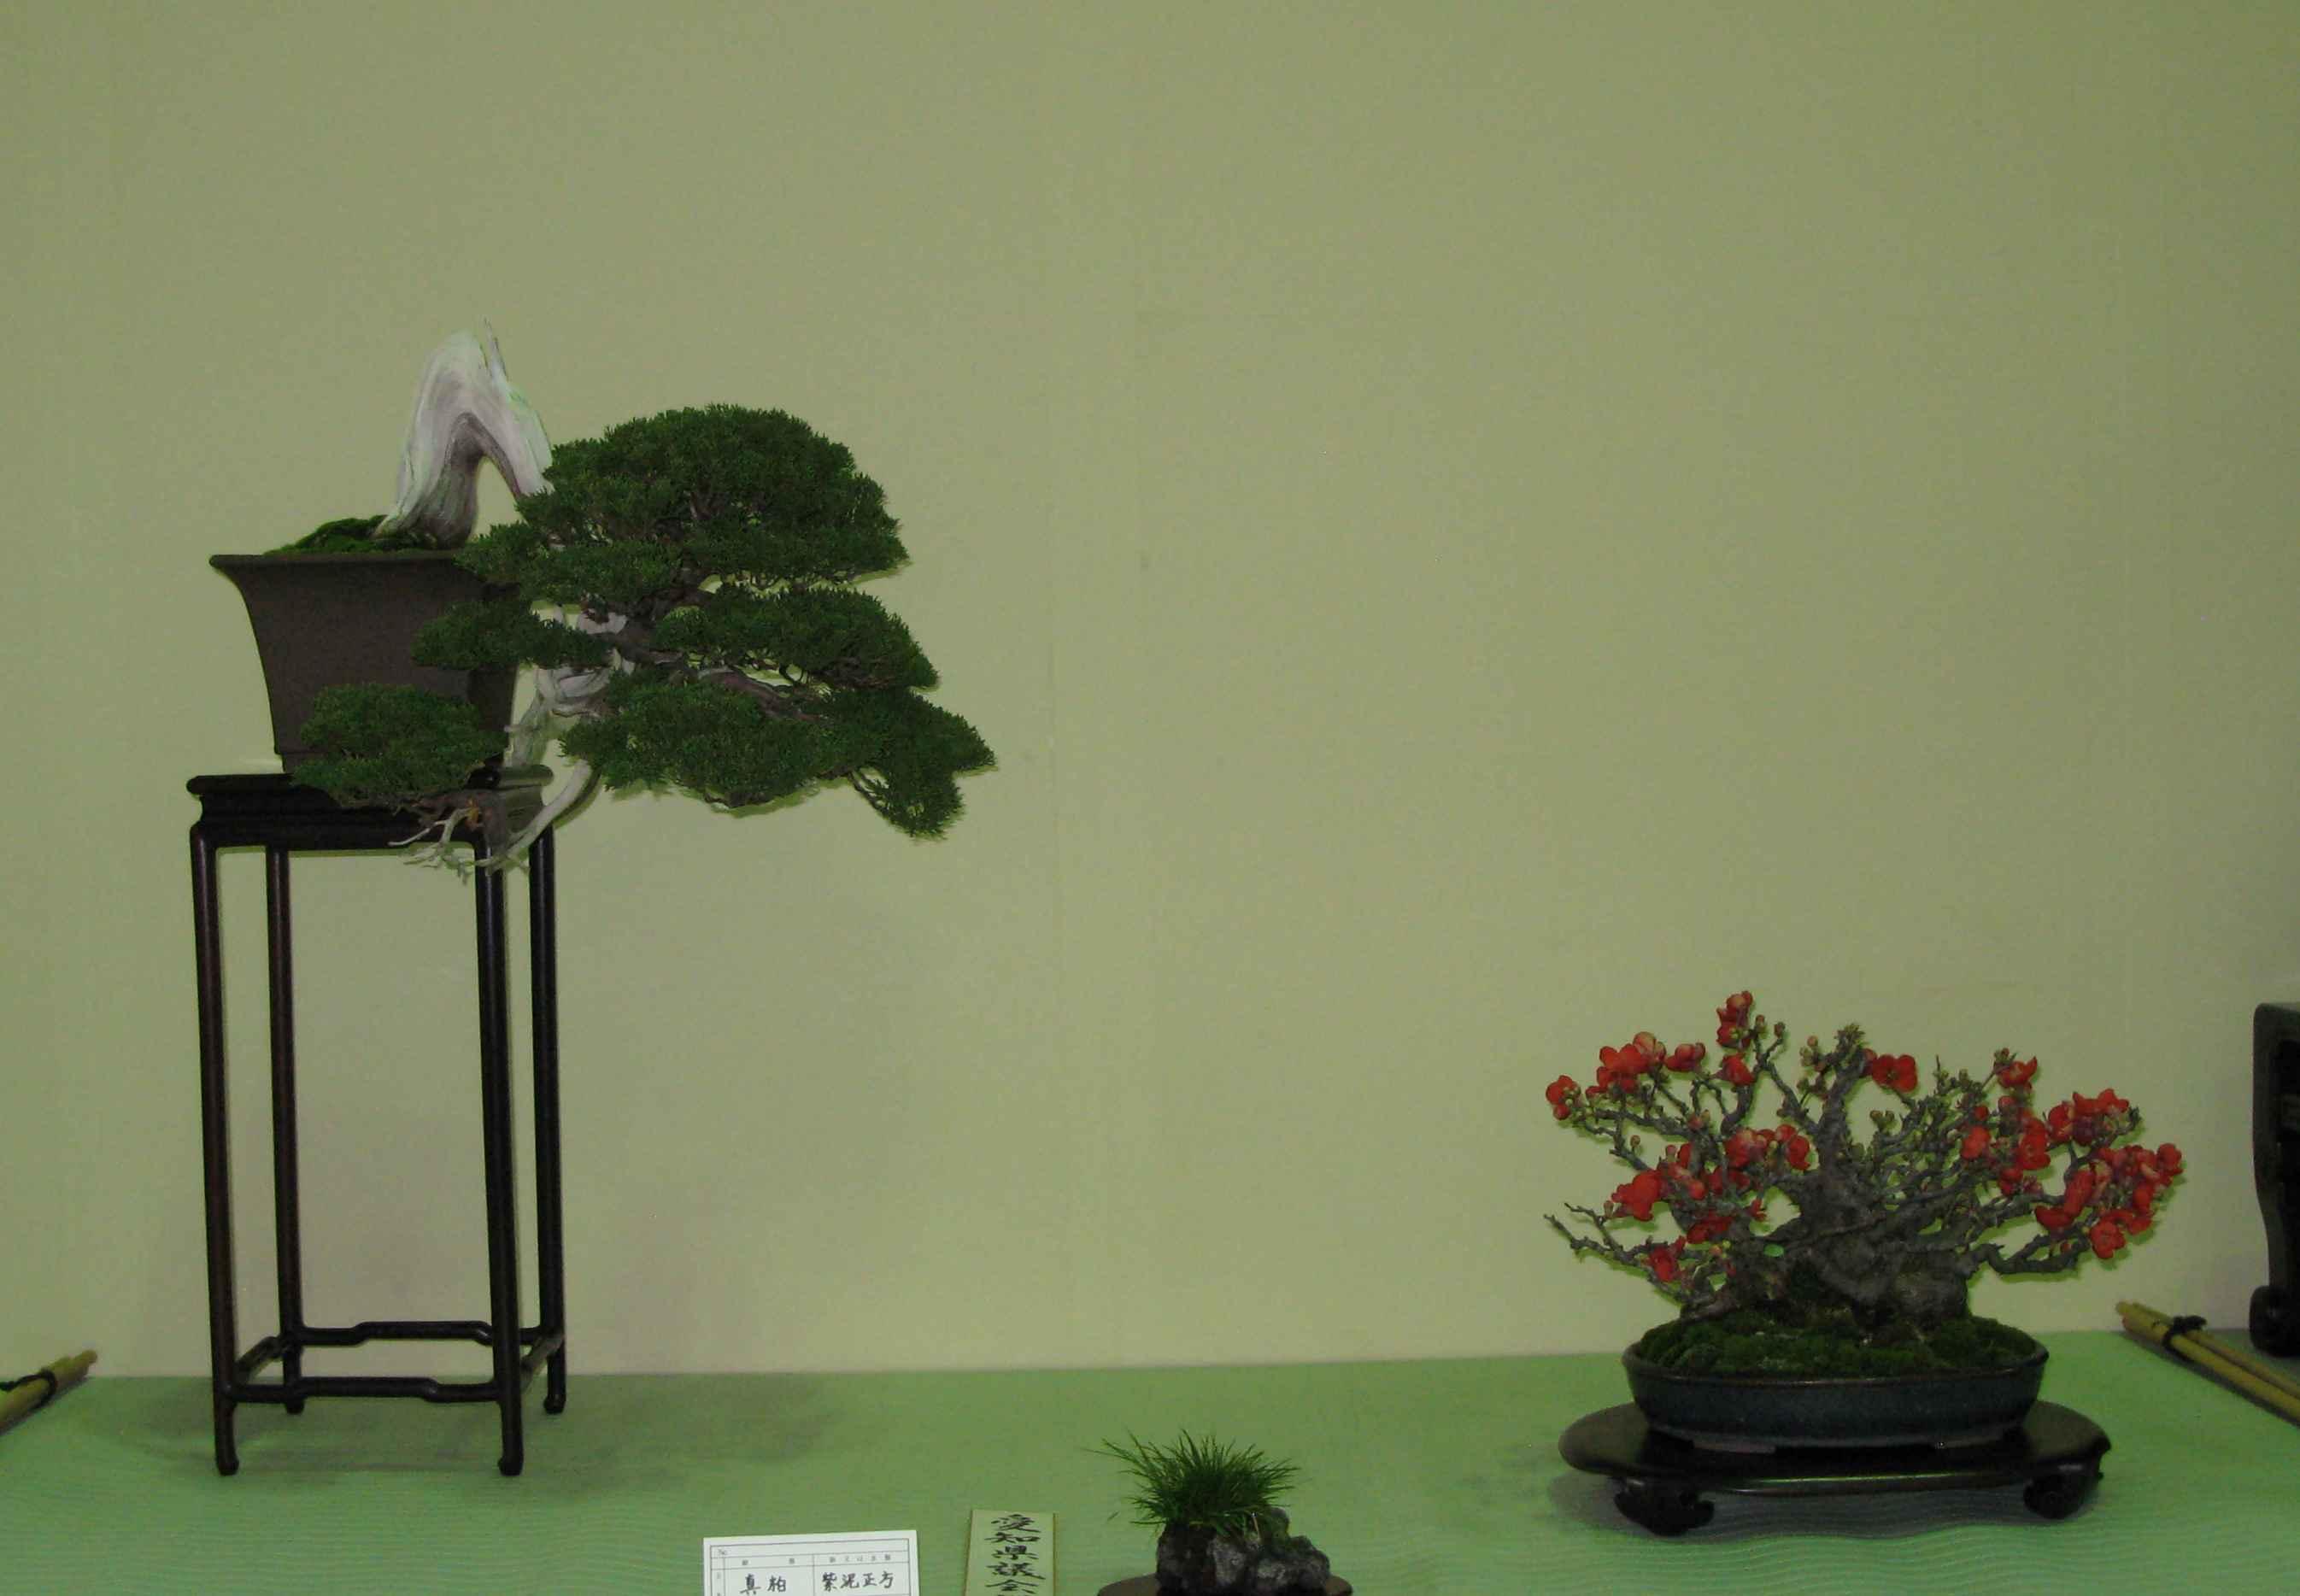 Maple Bonsai Species Guide from LV Bonsai